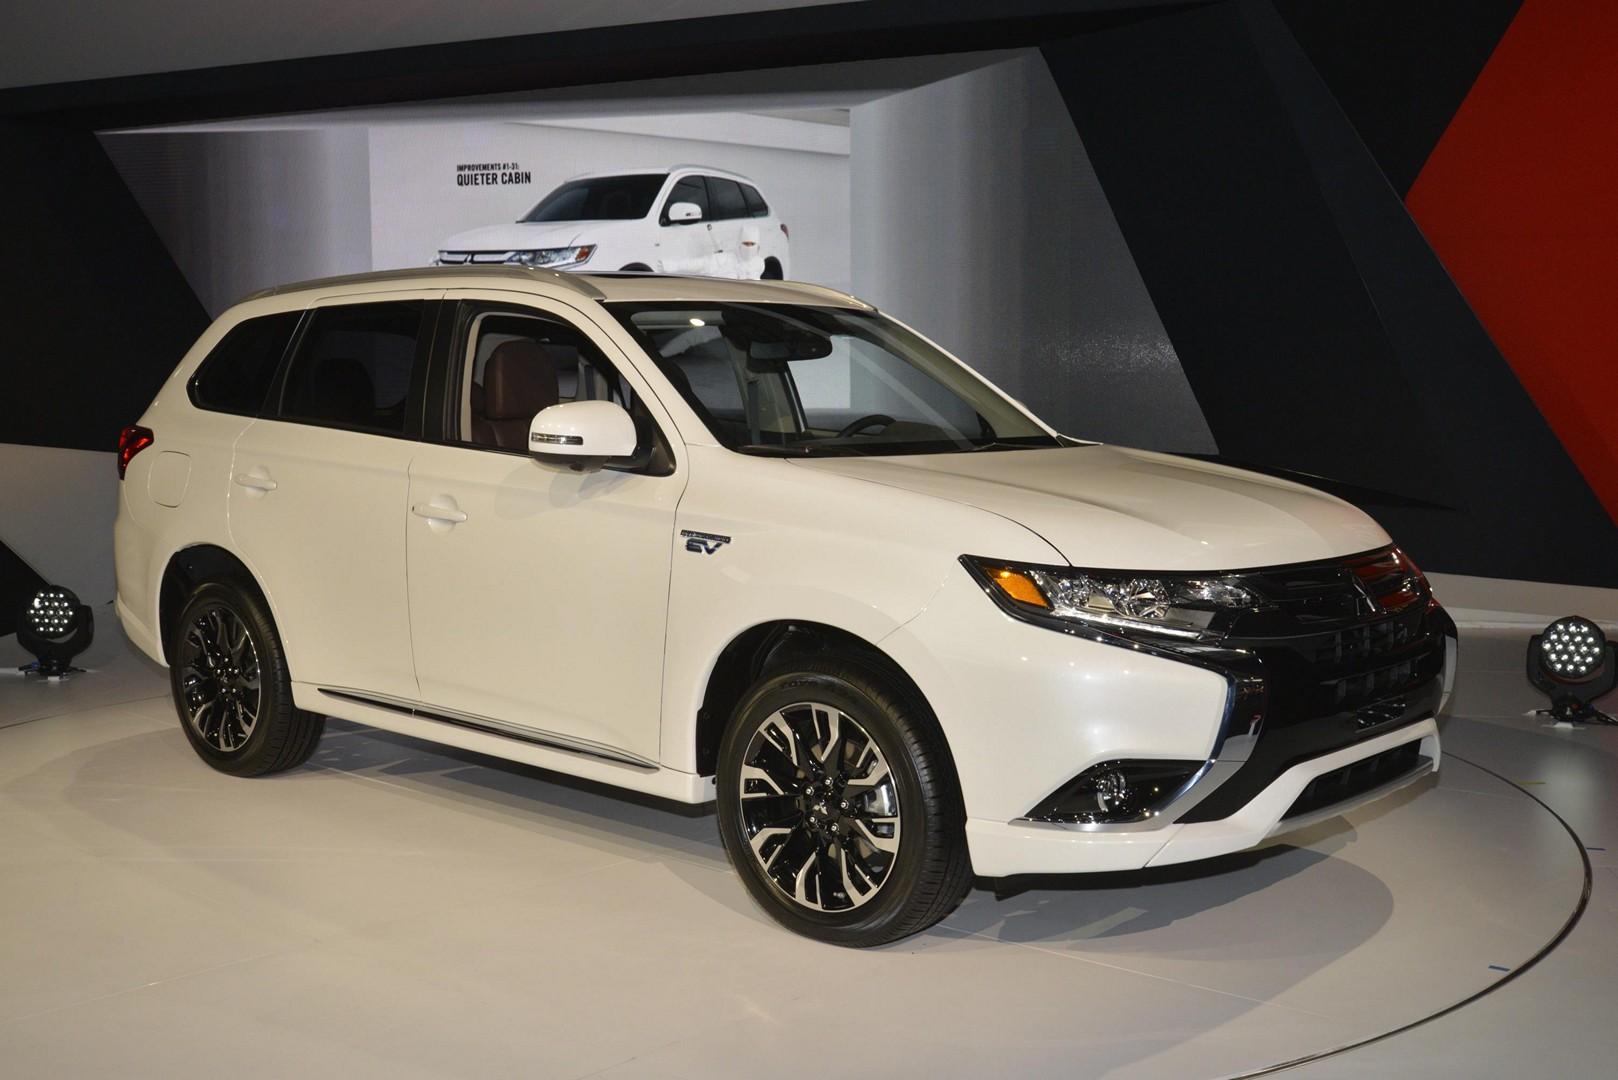 2017 Outlander Phev Makes Us Debut Mitsubishi Promises